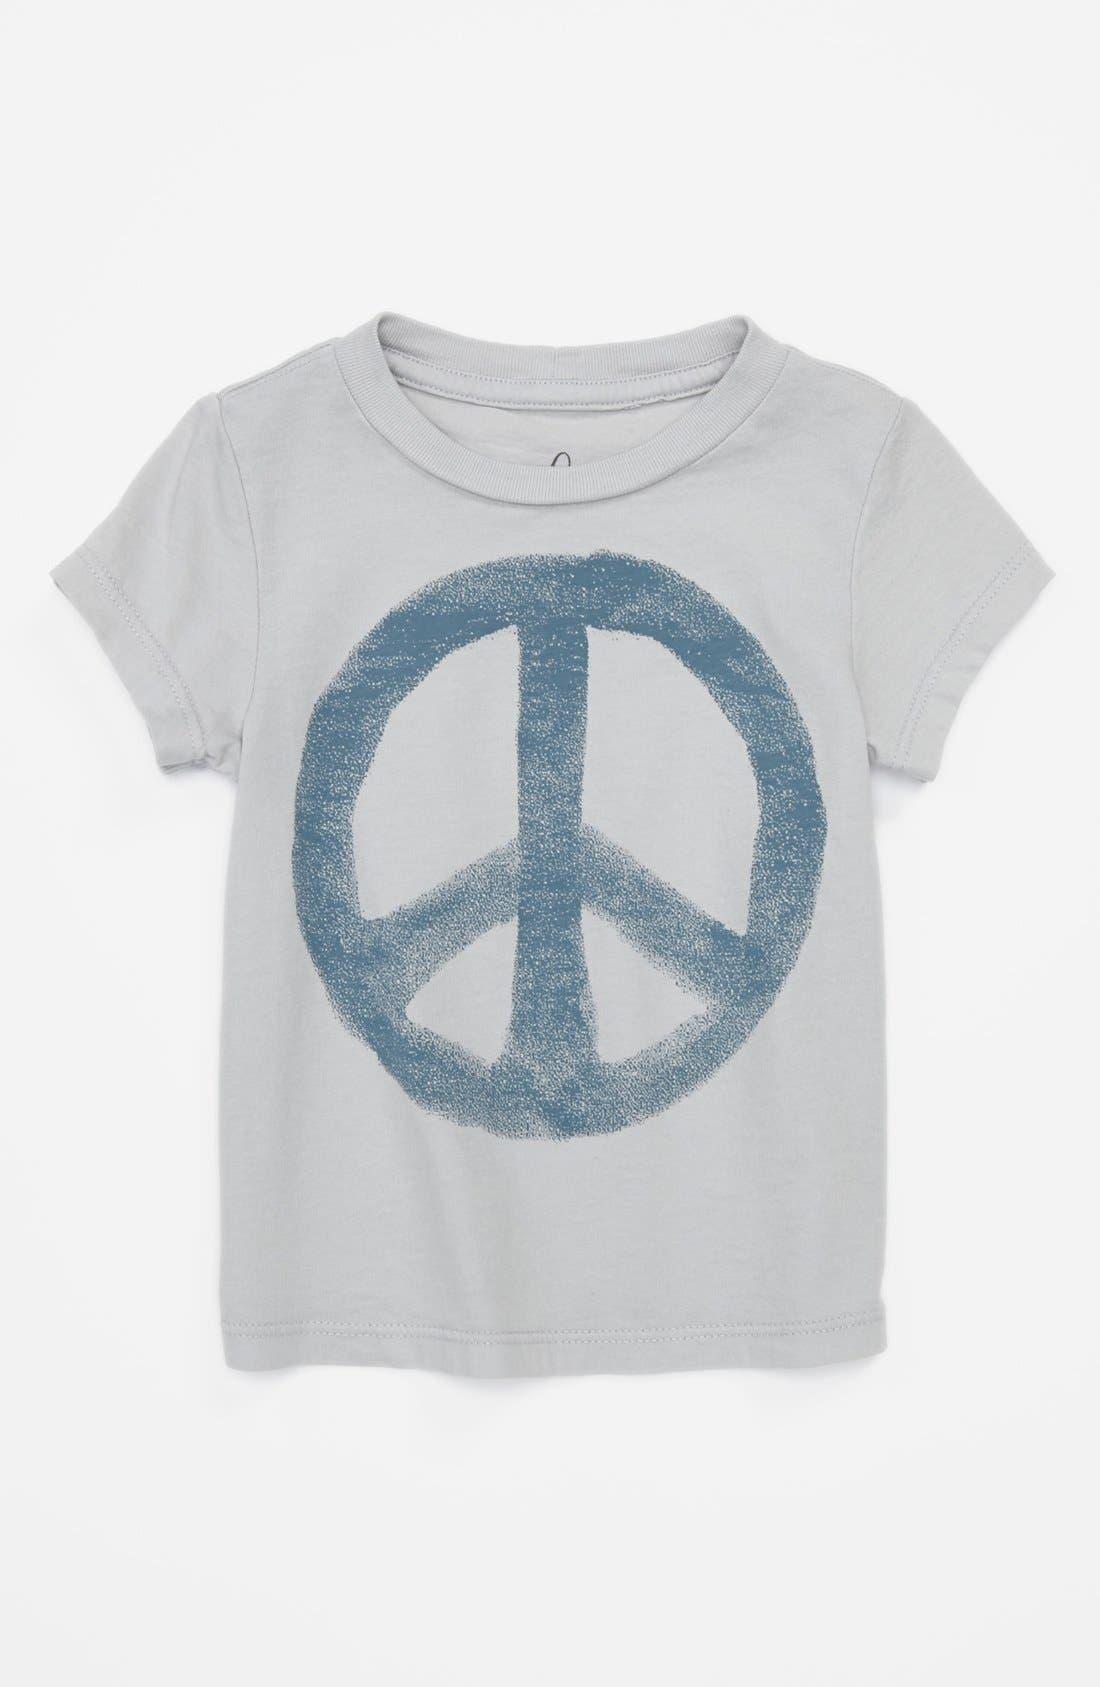 Main Image - Peek 'Peace - Little Peanut' T-Shirt (Baby Boys)